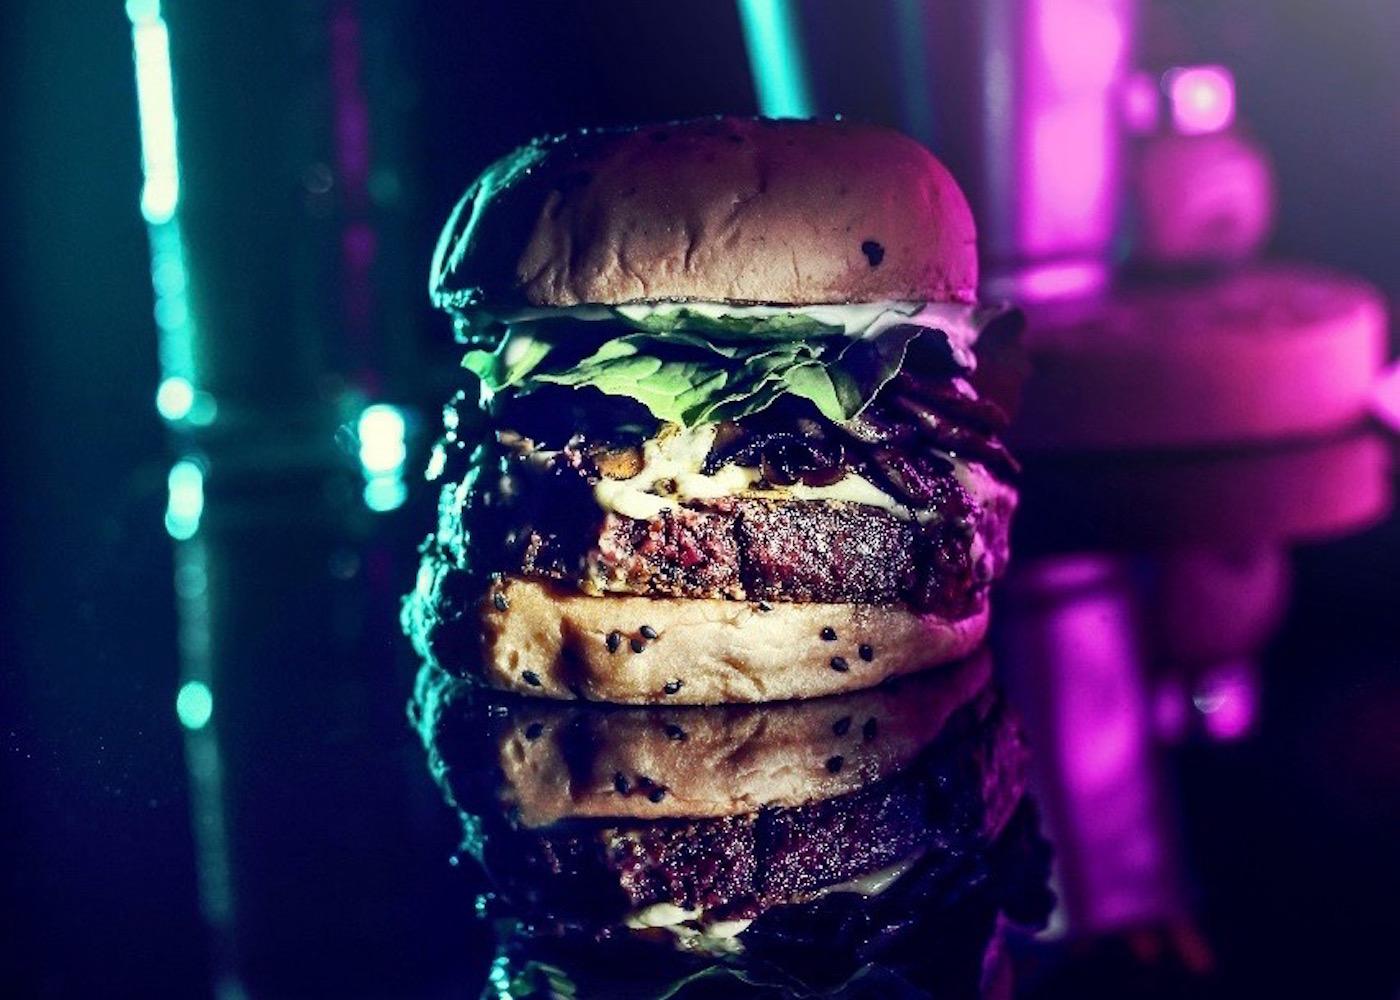 Beef Burger at BB52 Burger & Gin Bar in Canggu, Bali, Indonesia